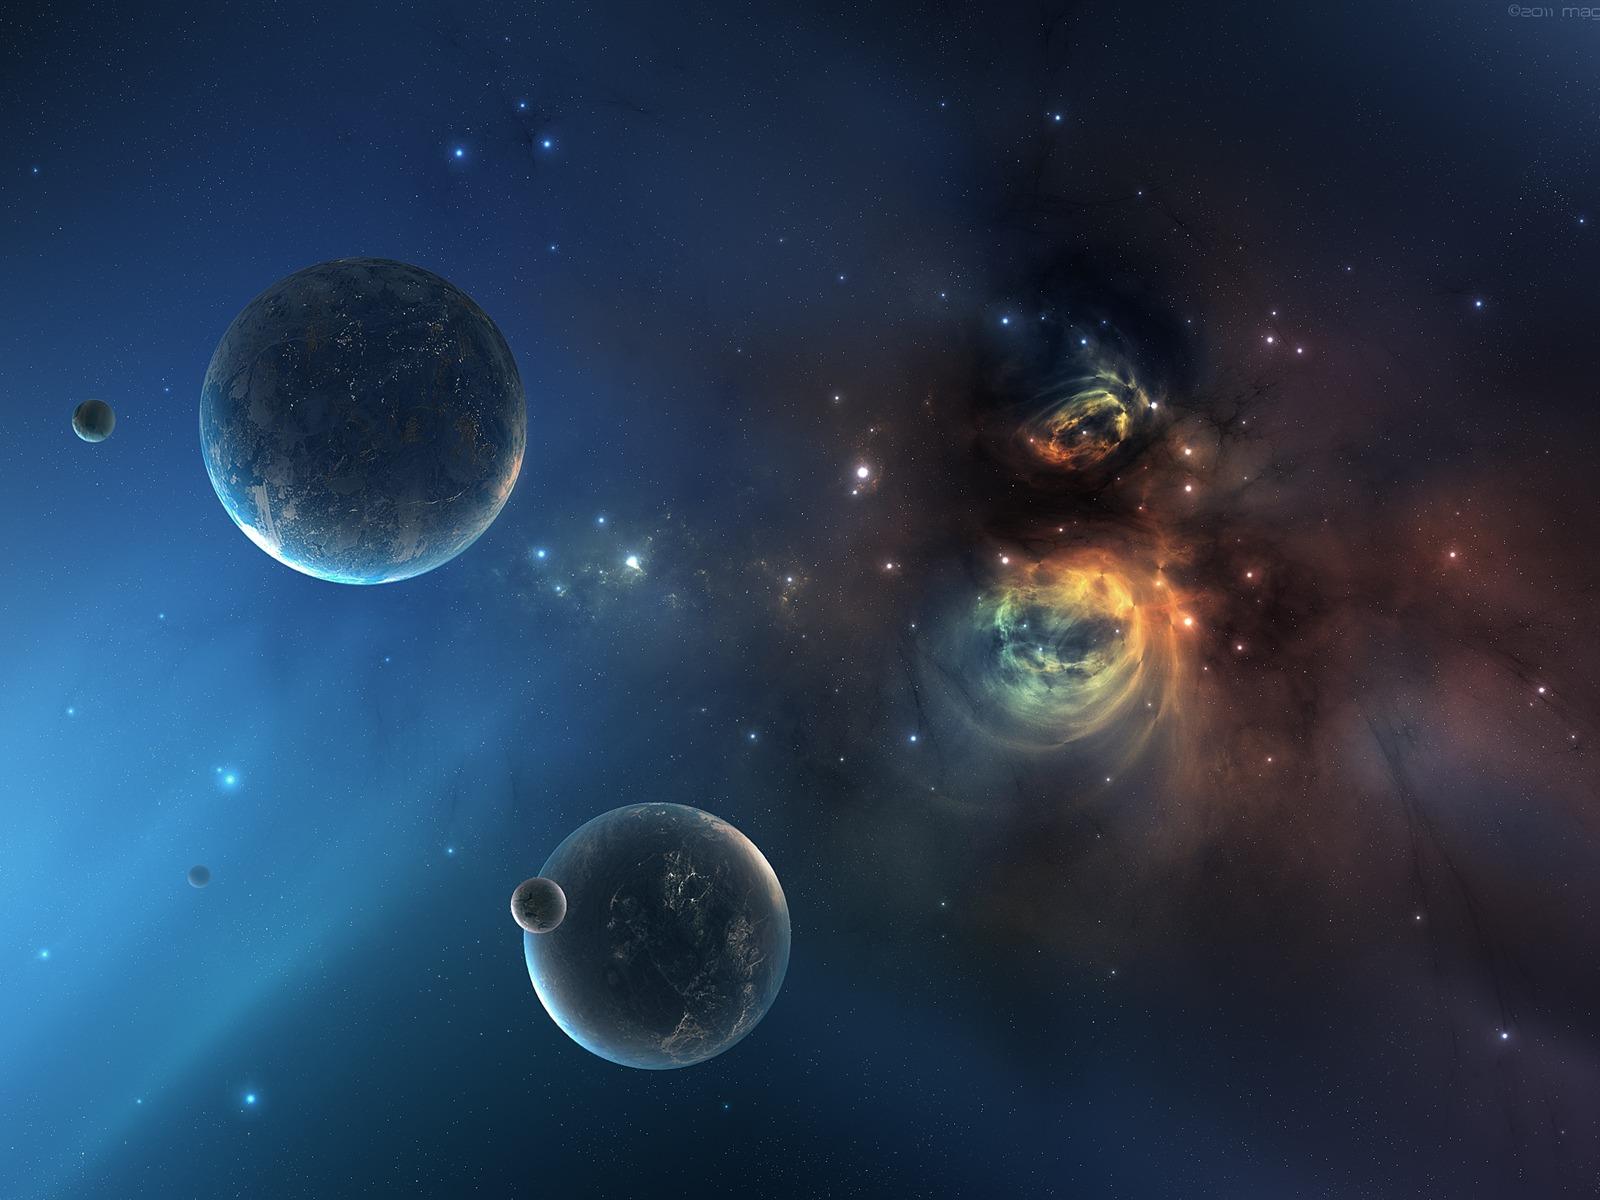 universe-wallpaper-3d-wallpaper-4